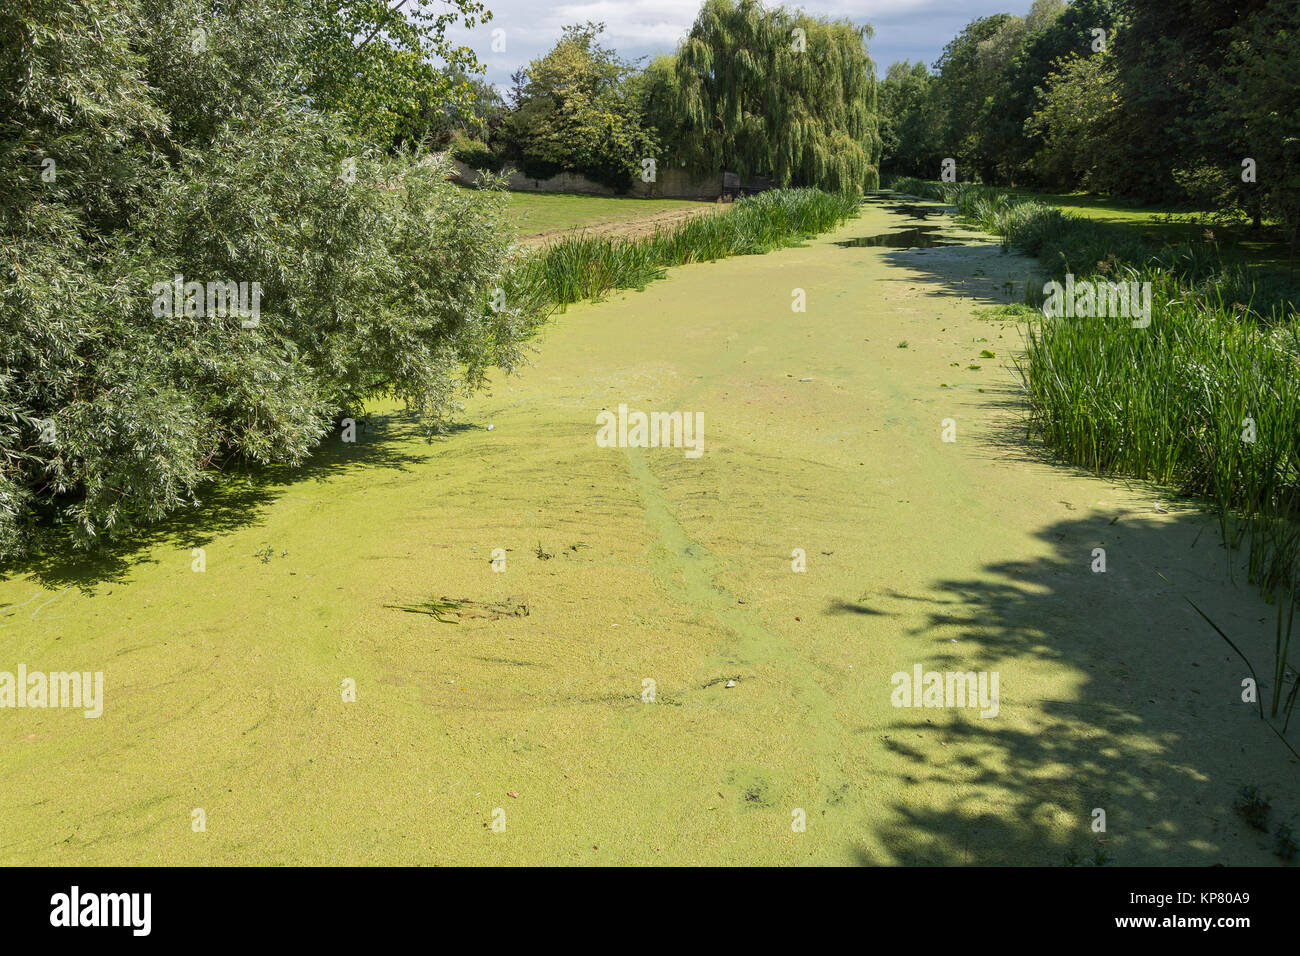 Blue-green algea covering River Great Ouse, Bridge Street, Olney, Buckinghamshire, England, United Kingdom - Stock Image